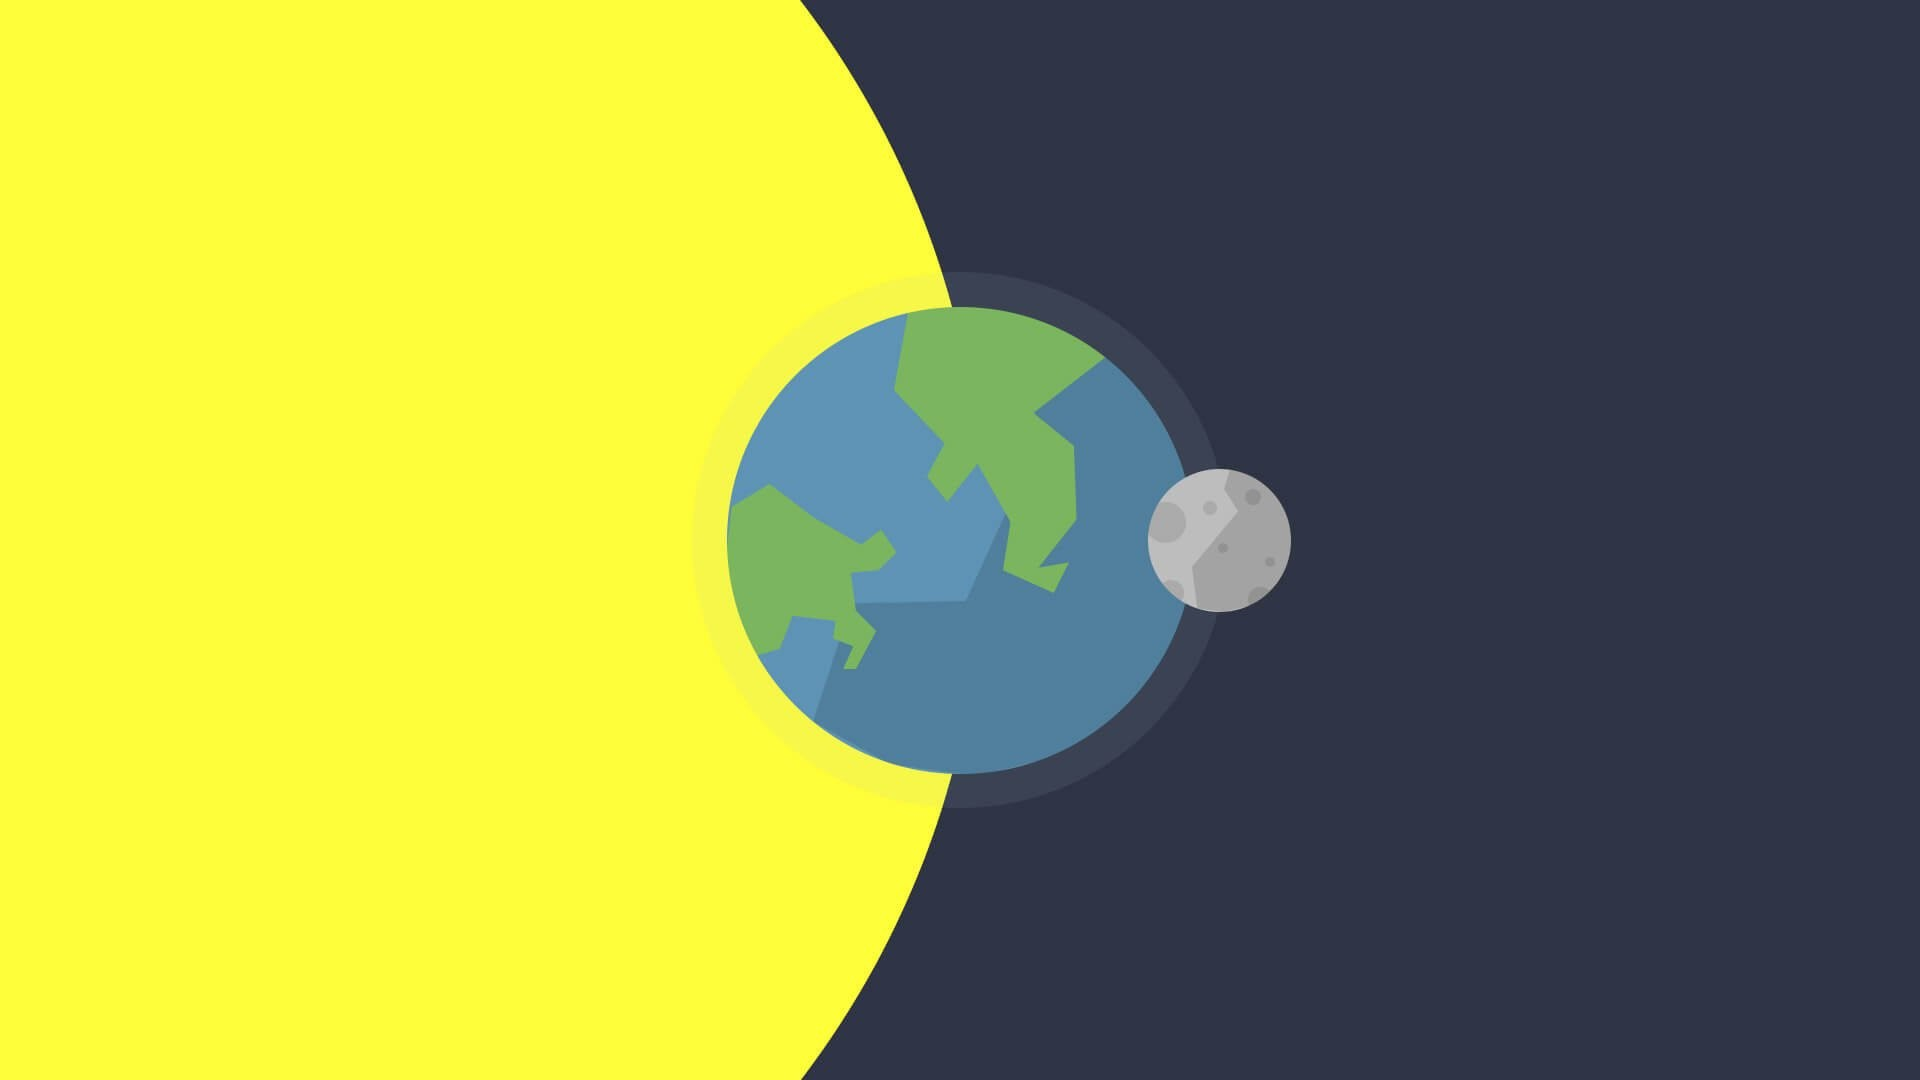 Res: 1920x1080, ... Minimalistic-Wallpaper-09 snes space-earth ...